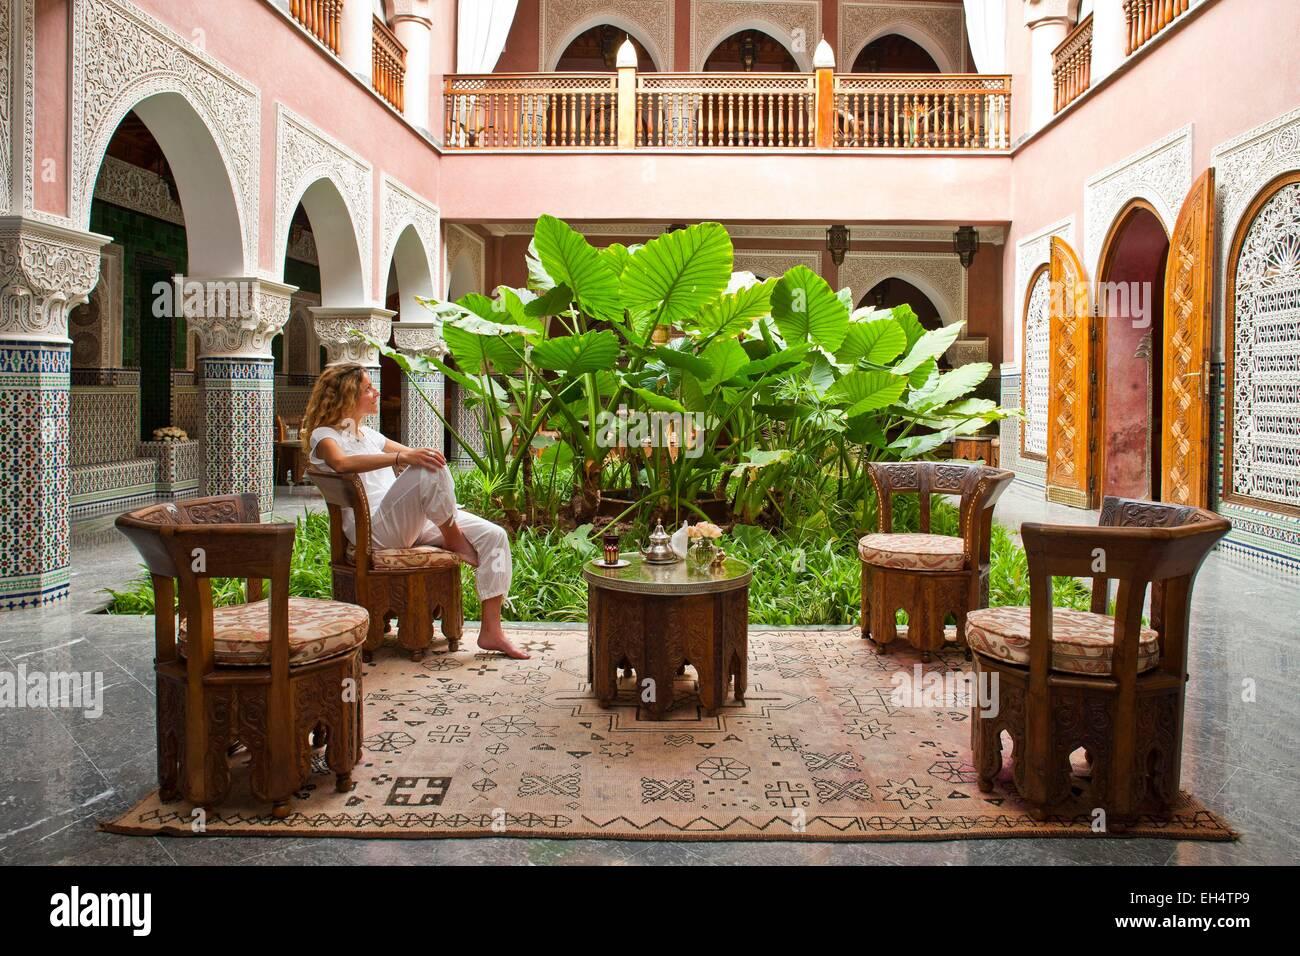 Morocco high atlas marrakech imperial city luxury hotel la sultana 5 stars woman taking a mint tea in an interior room